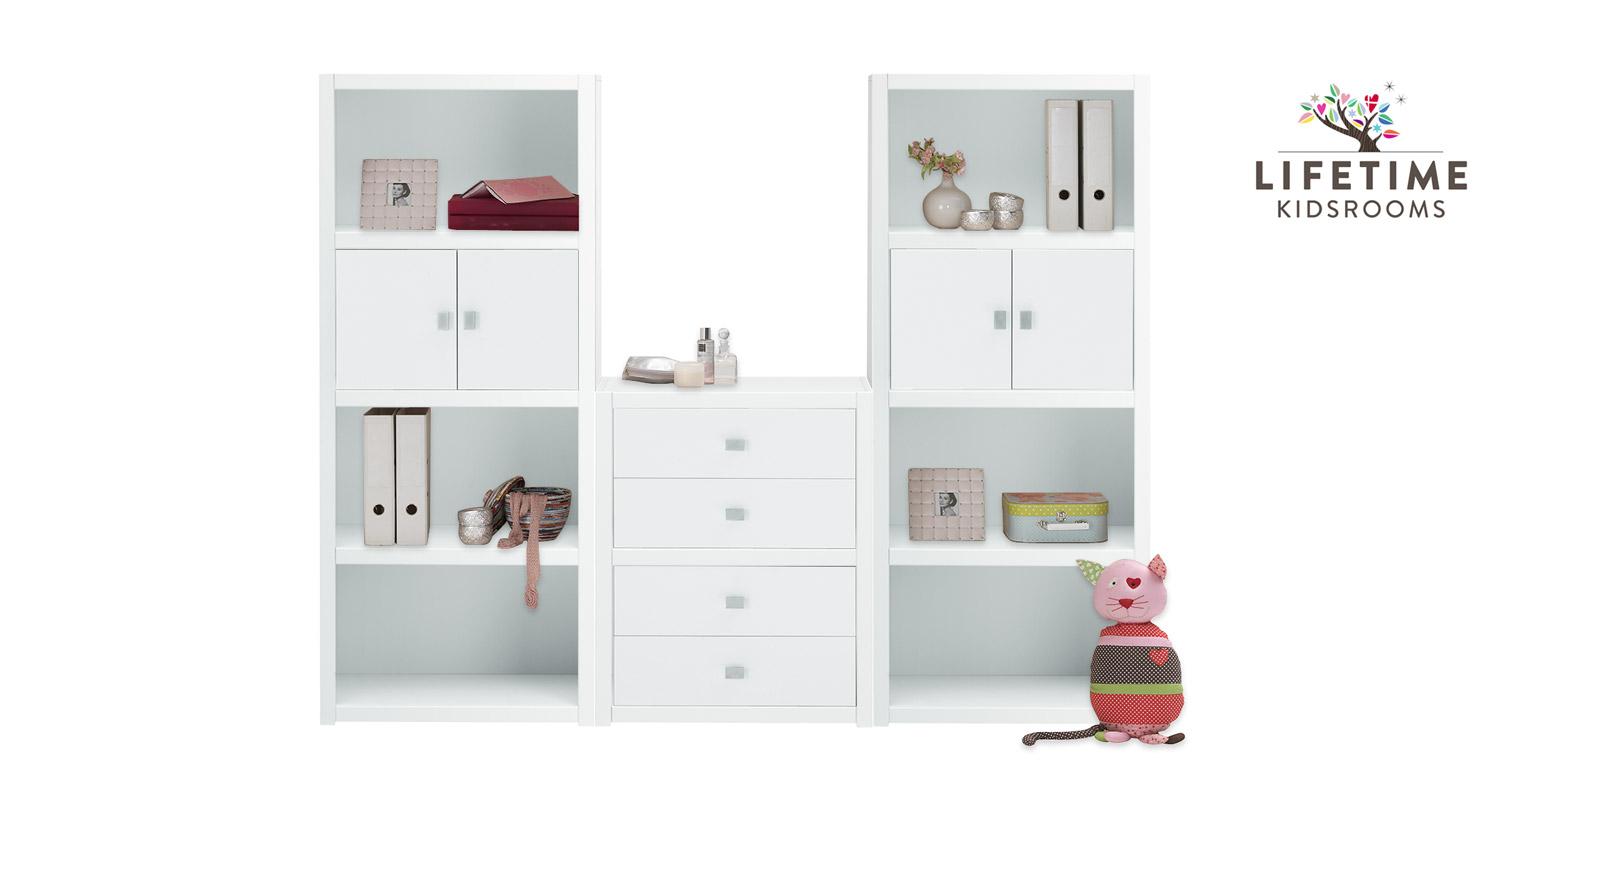 wei e regalwand original von lifetime in gr e m. Black Bedroom Furniture Sets. Home Design Ideas